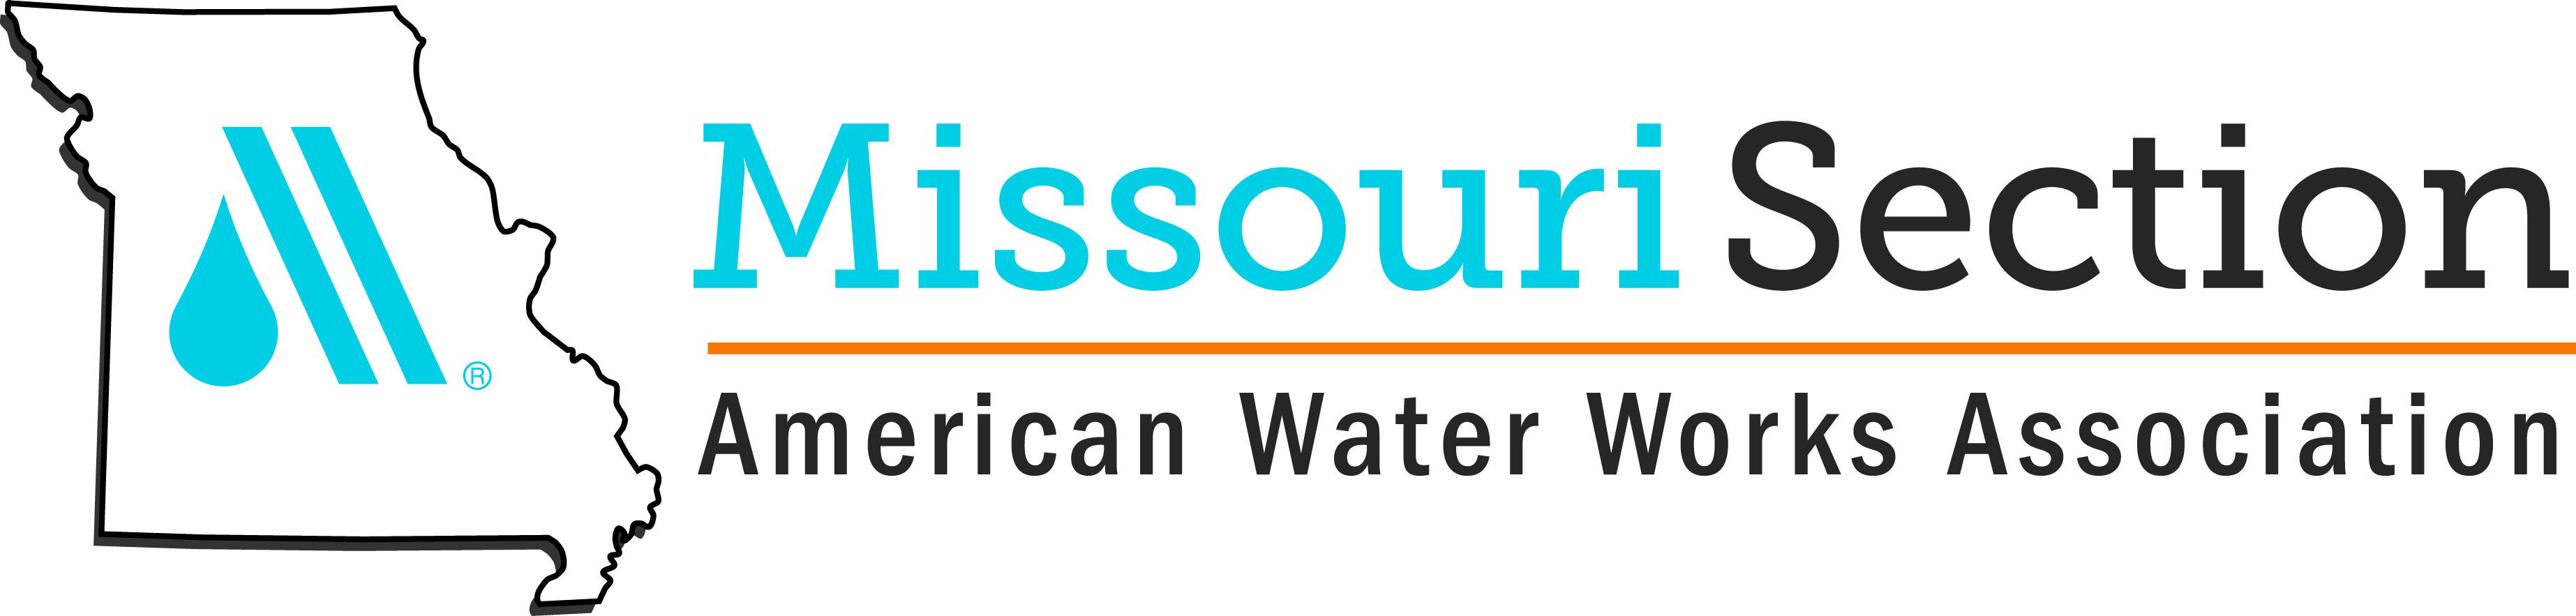 Missouri_LogoC